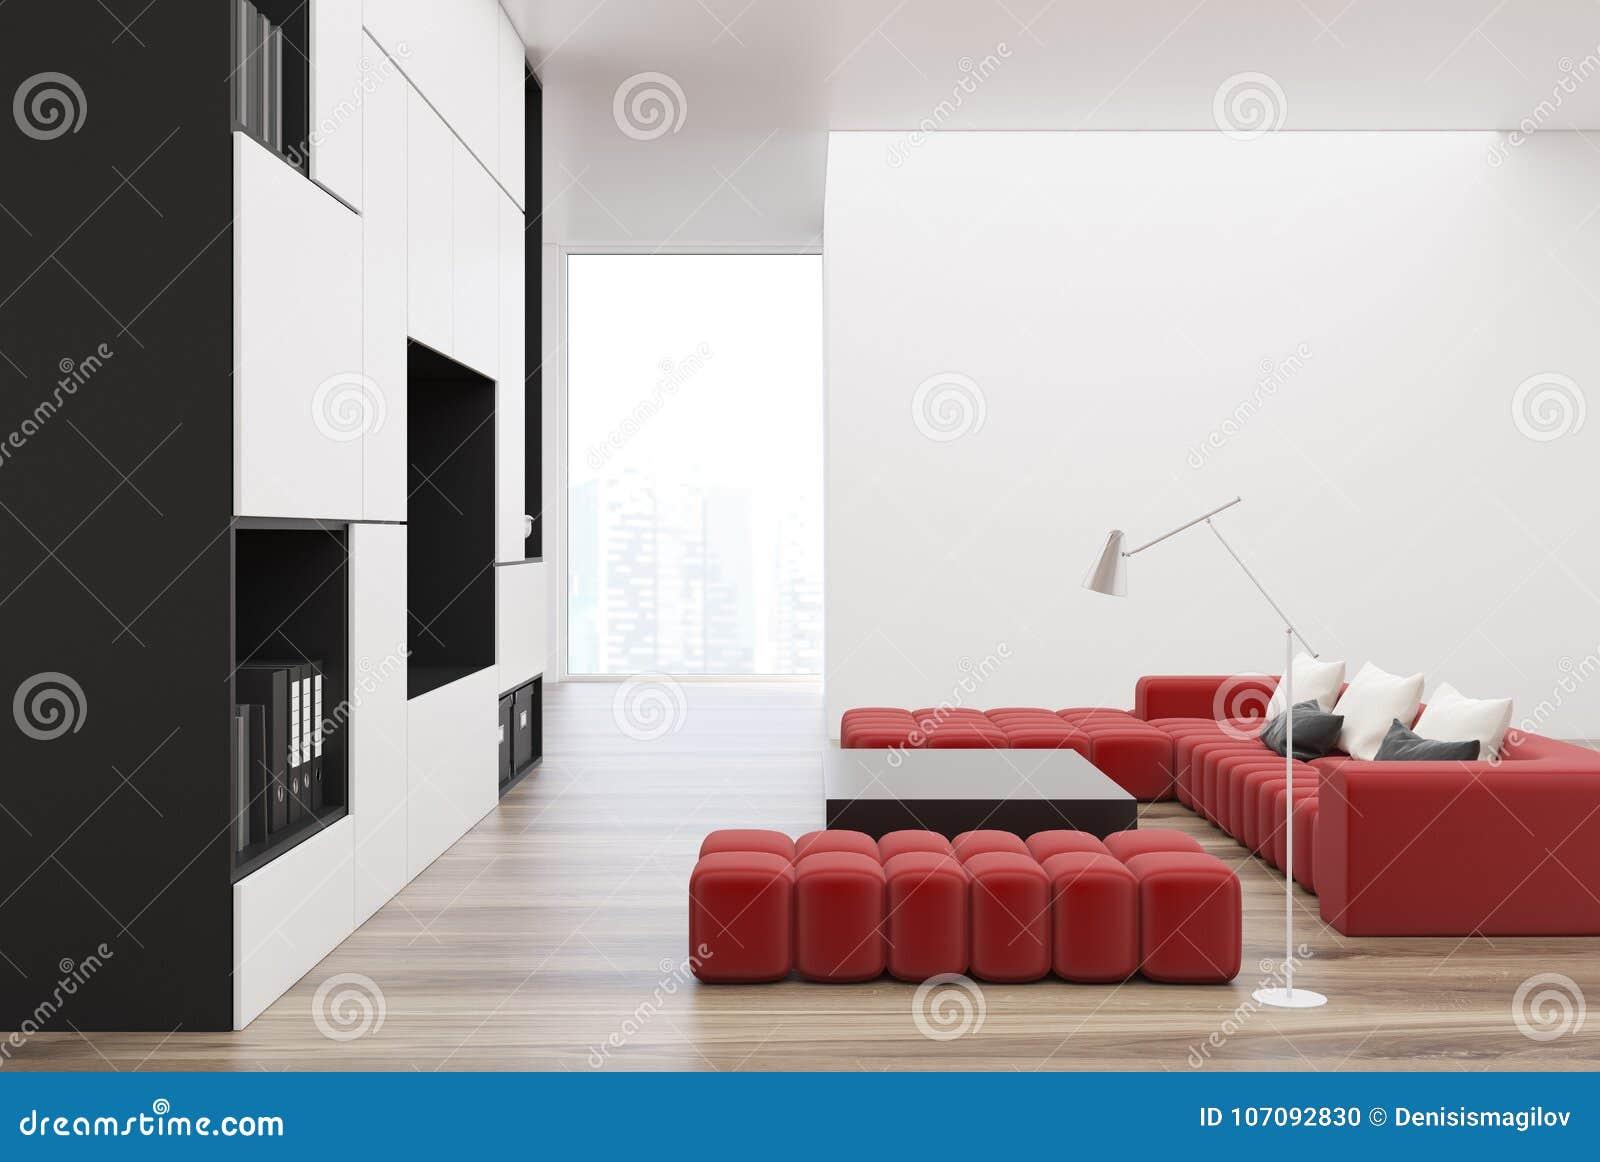 White And Black Living Room, TV, Red Sofa Stock Illustration ...